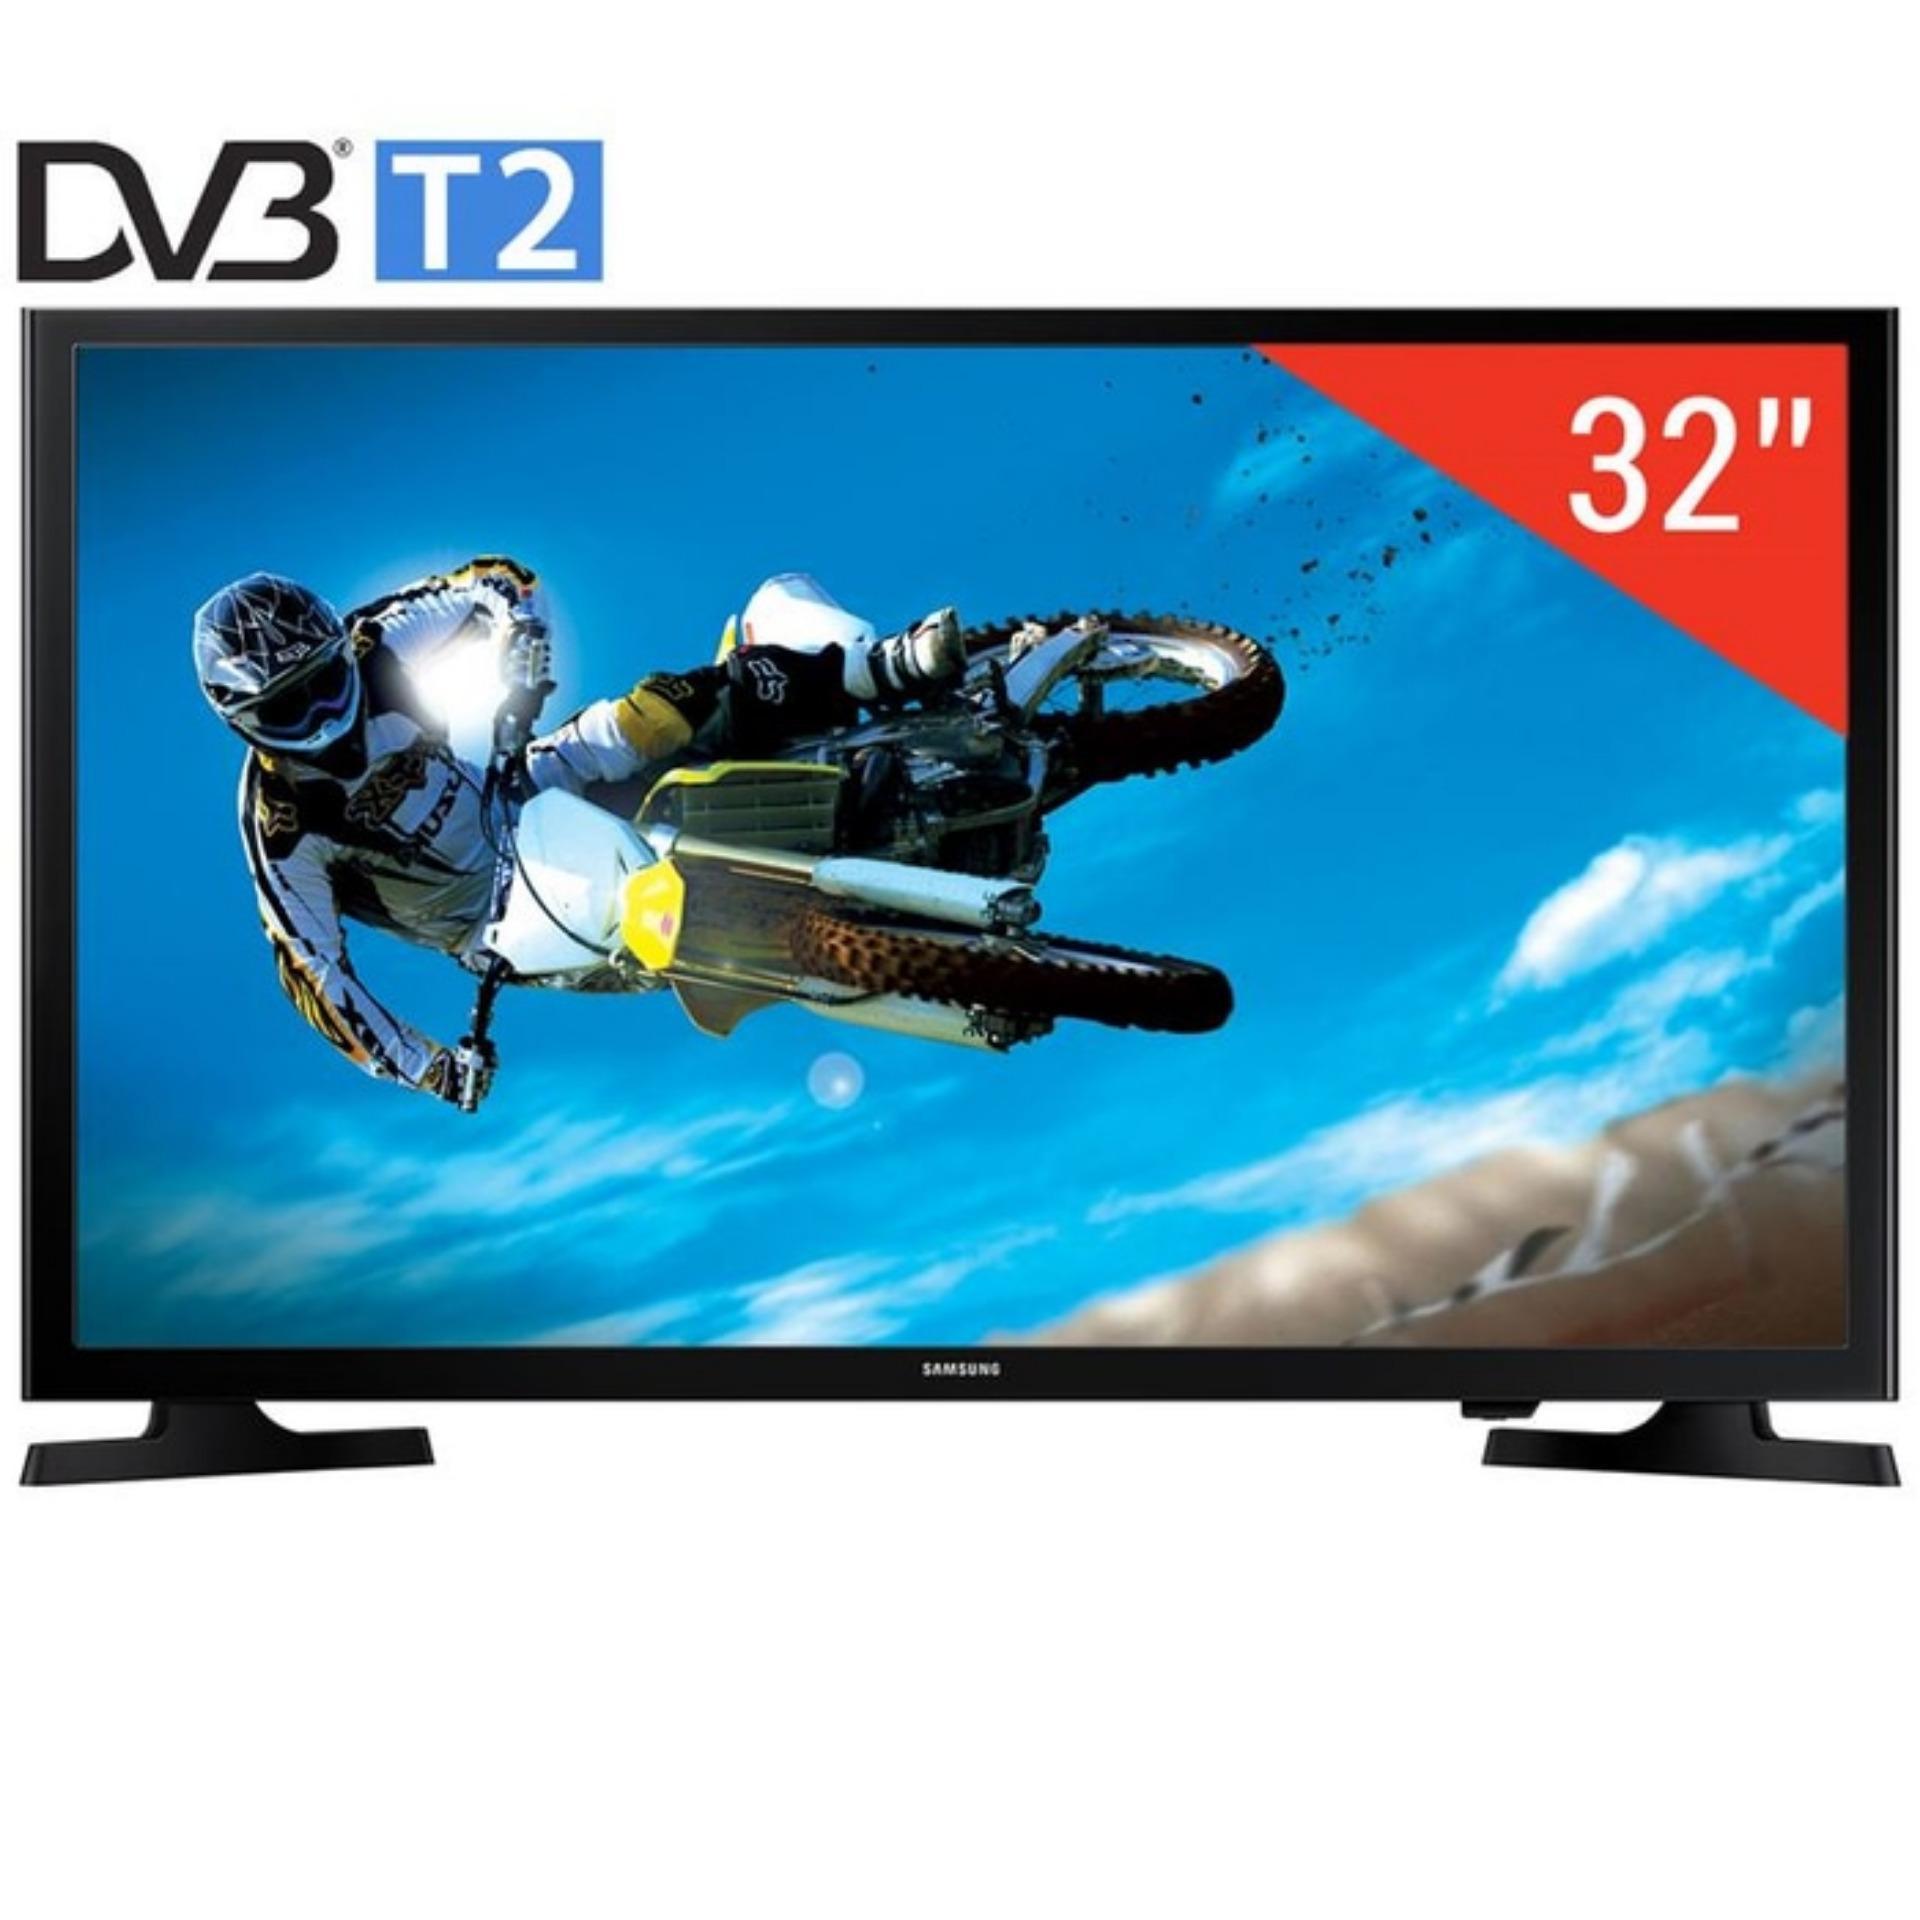 Samsung Ua32j4303 Led Tv 32 Hd Smart Hitam Daftar Harga Terbaru Lg 49 Inch 49lh511t Digital